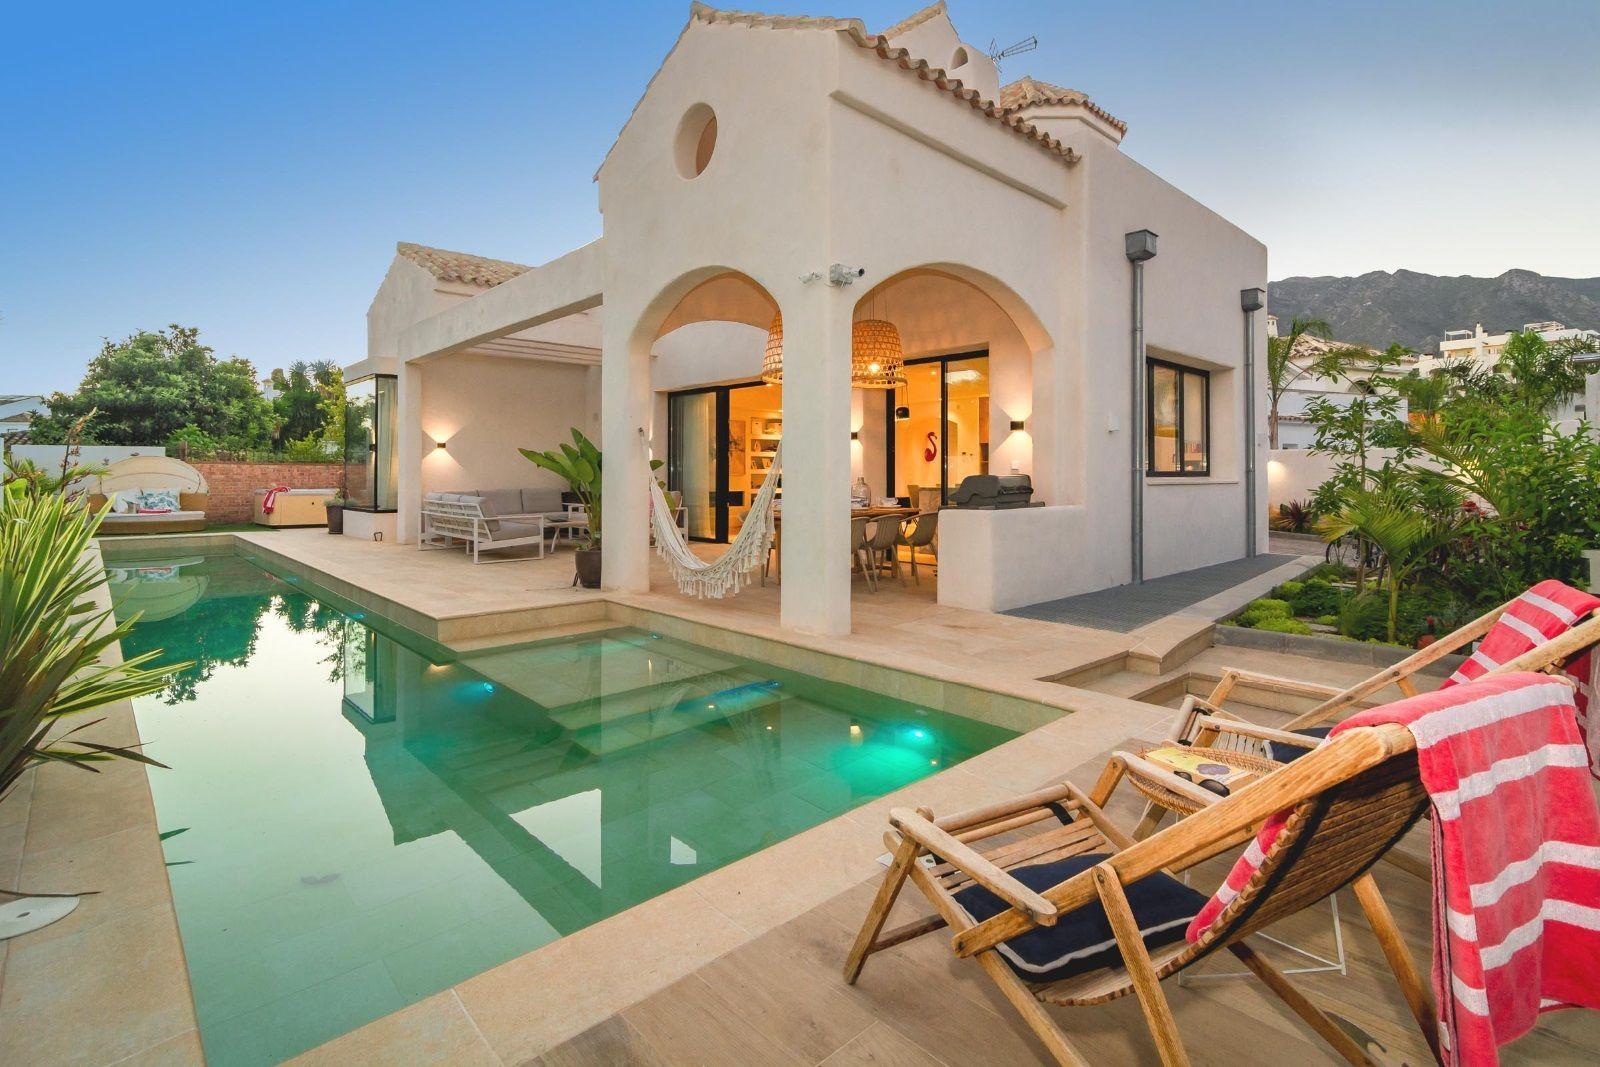 Luxury villa in La Milla de Oro, Marbella